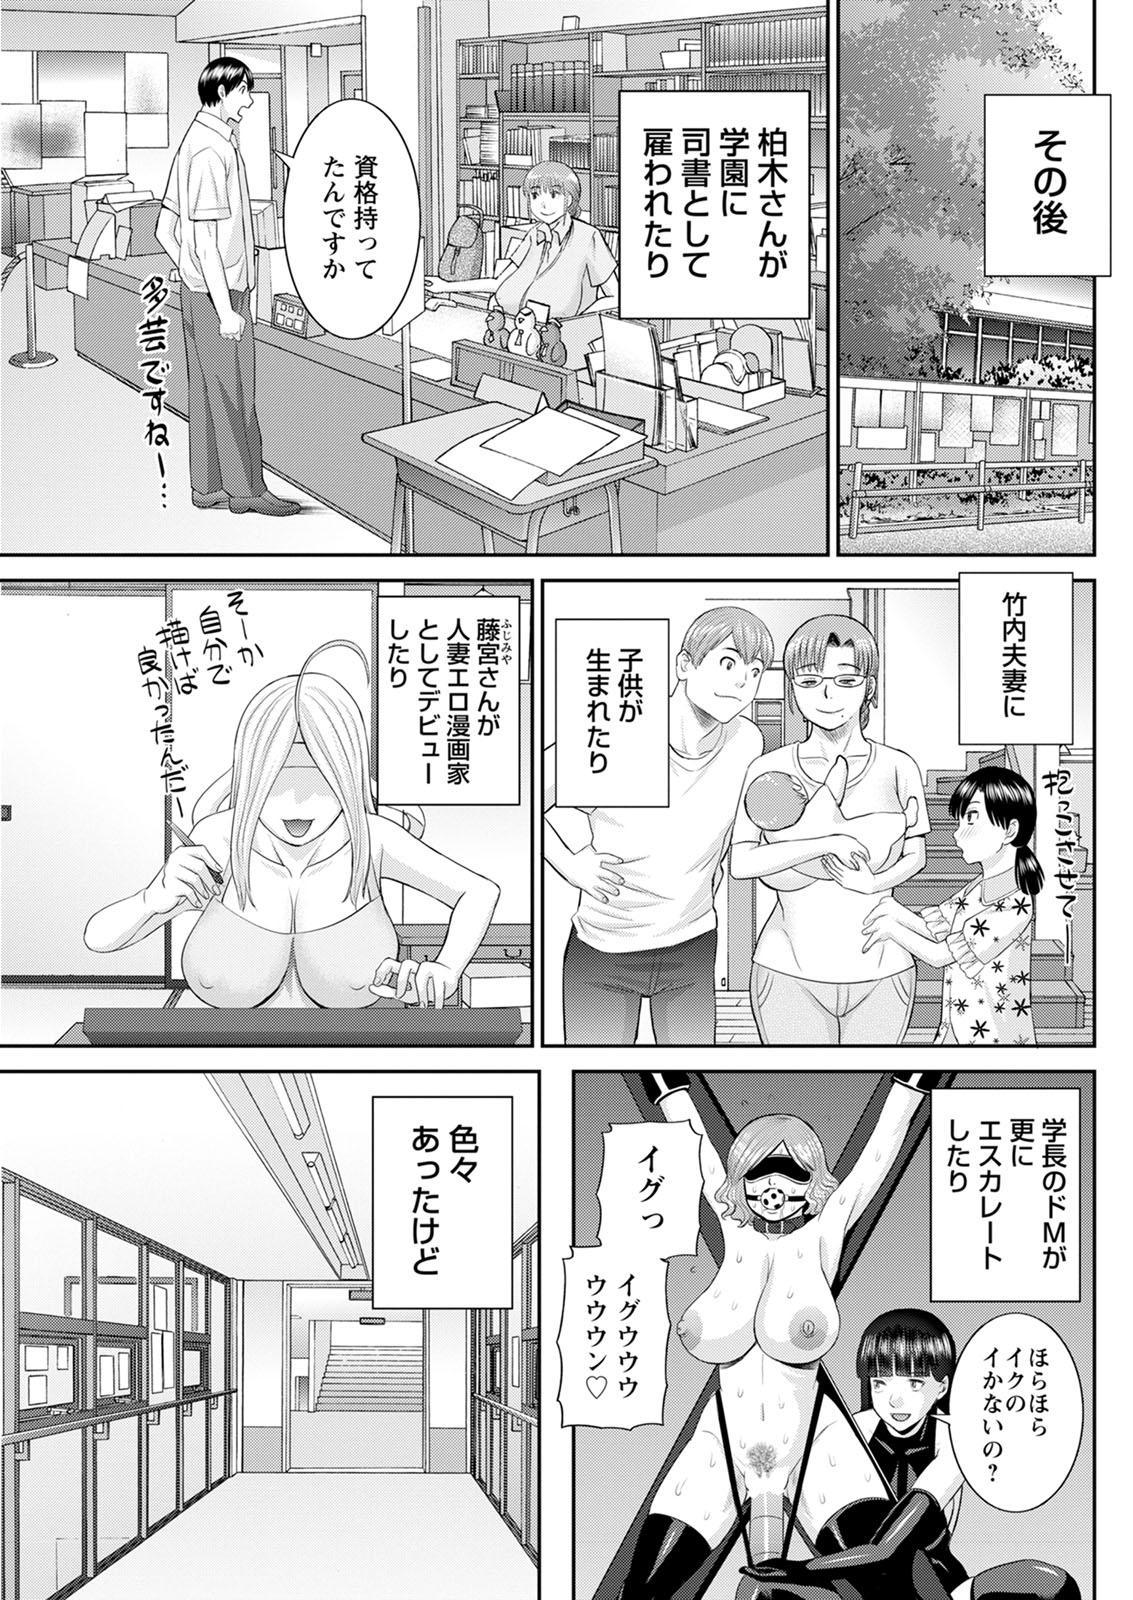 [Kawamori Misaki] Kaikan Hitotsuma Gakuen Ch. 1-6, 8-20 [Digital] 349